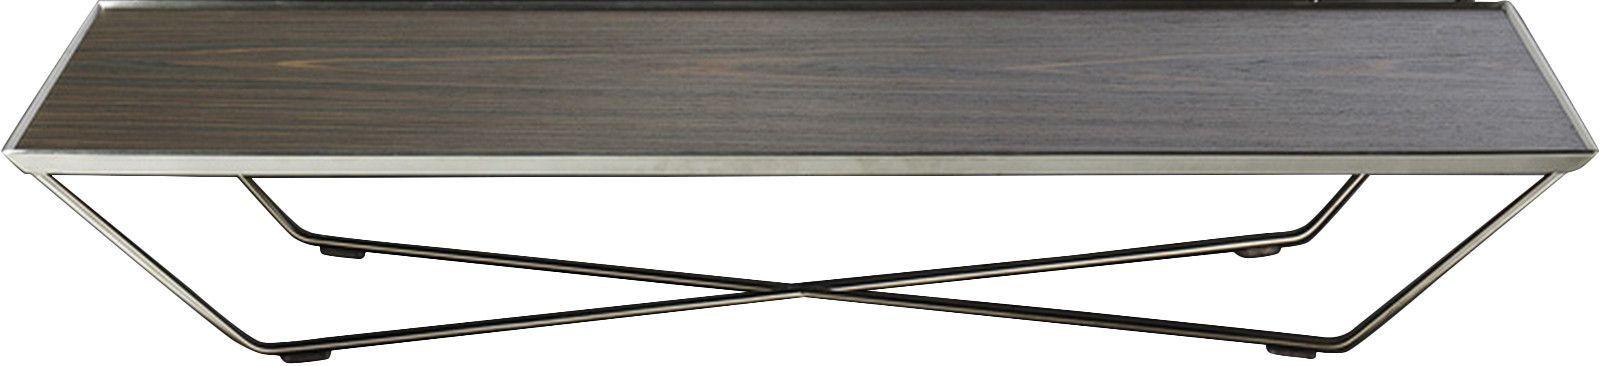 Modloft Cale 59in Coffee Table